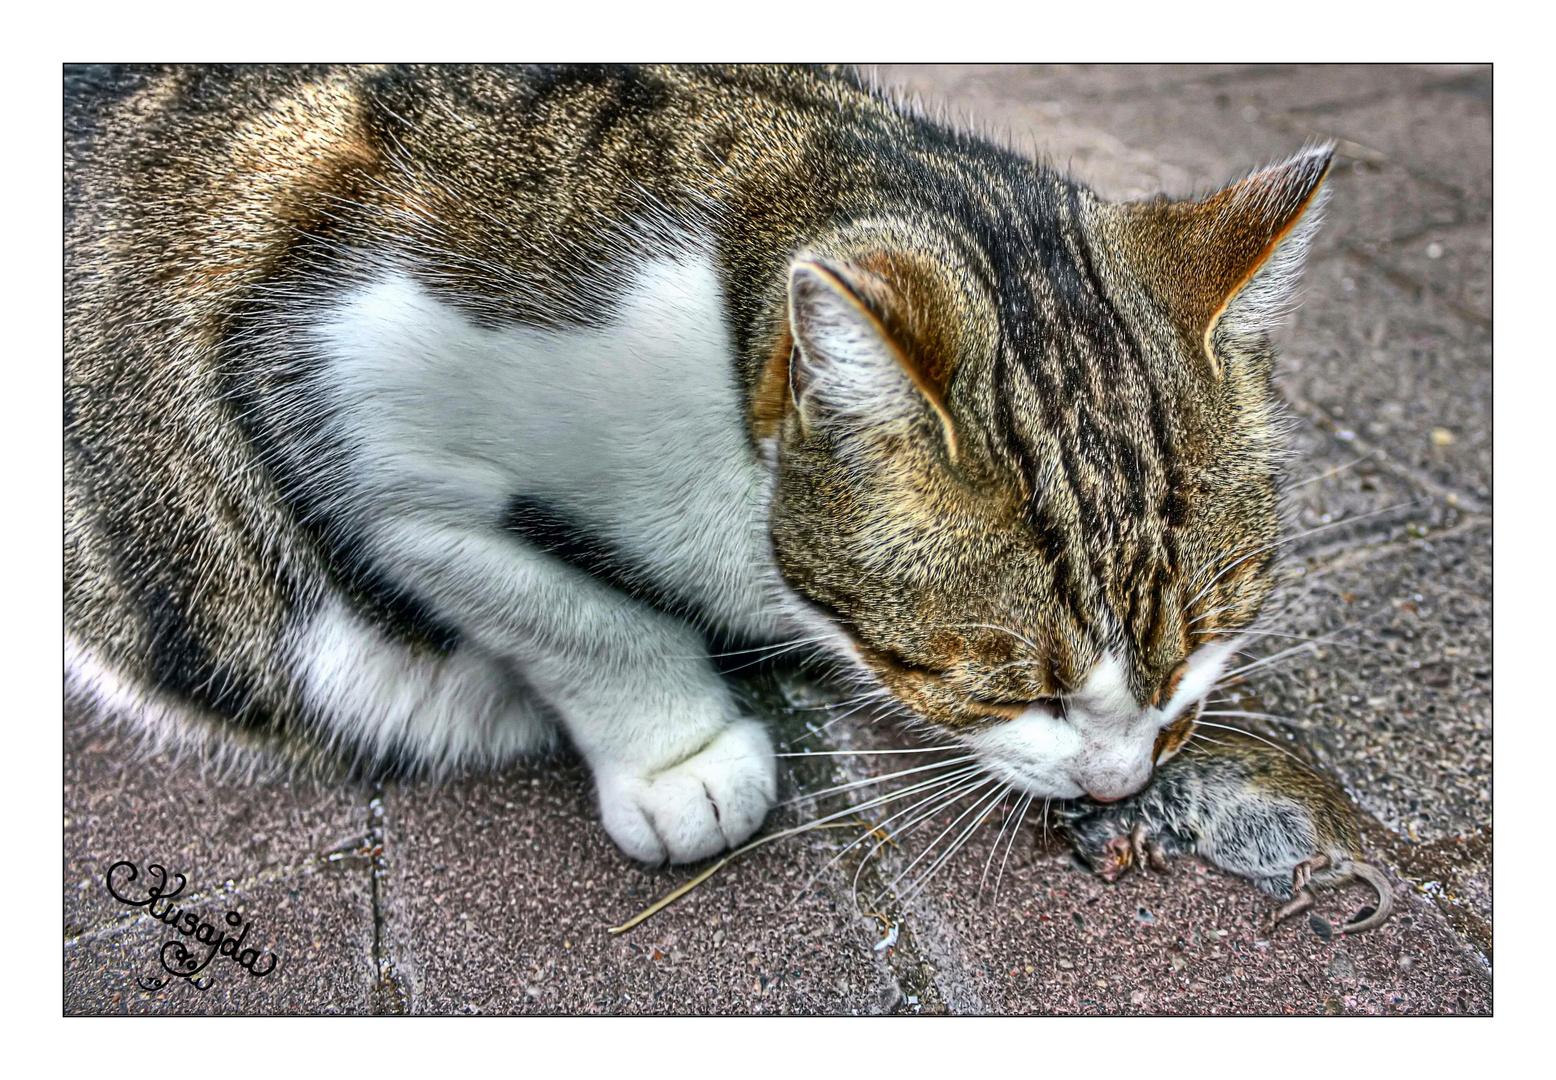 Katzen fressen Mäuse!